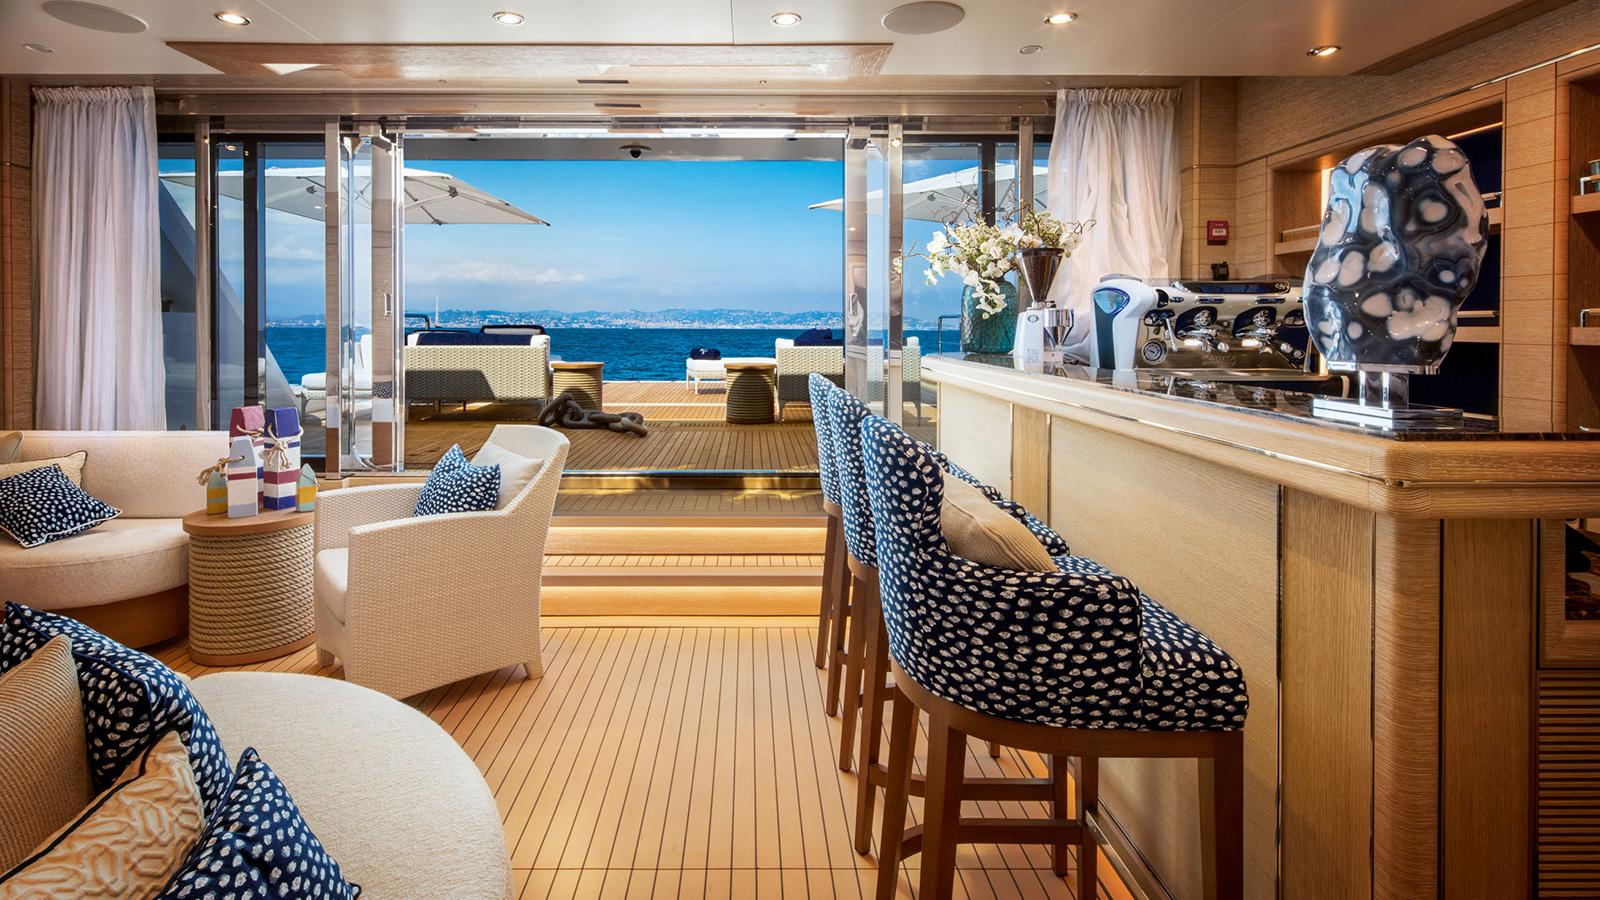 0WbBLDOhS0KE2M0wIGlx_Cloud-9-yacht-beach-club-bar-credit-maurizio-paradisi-crn-1920x1080.jpg